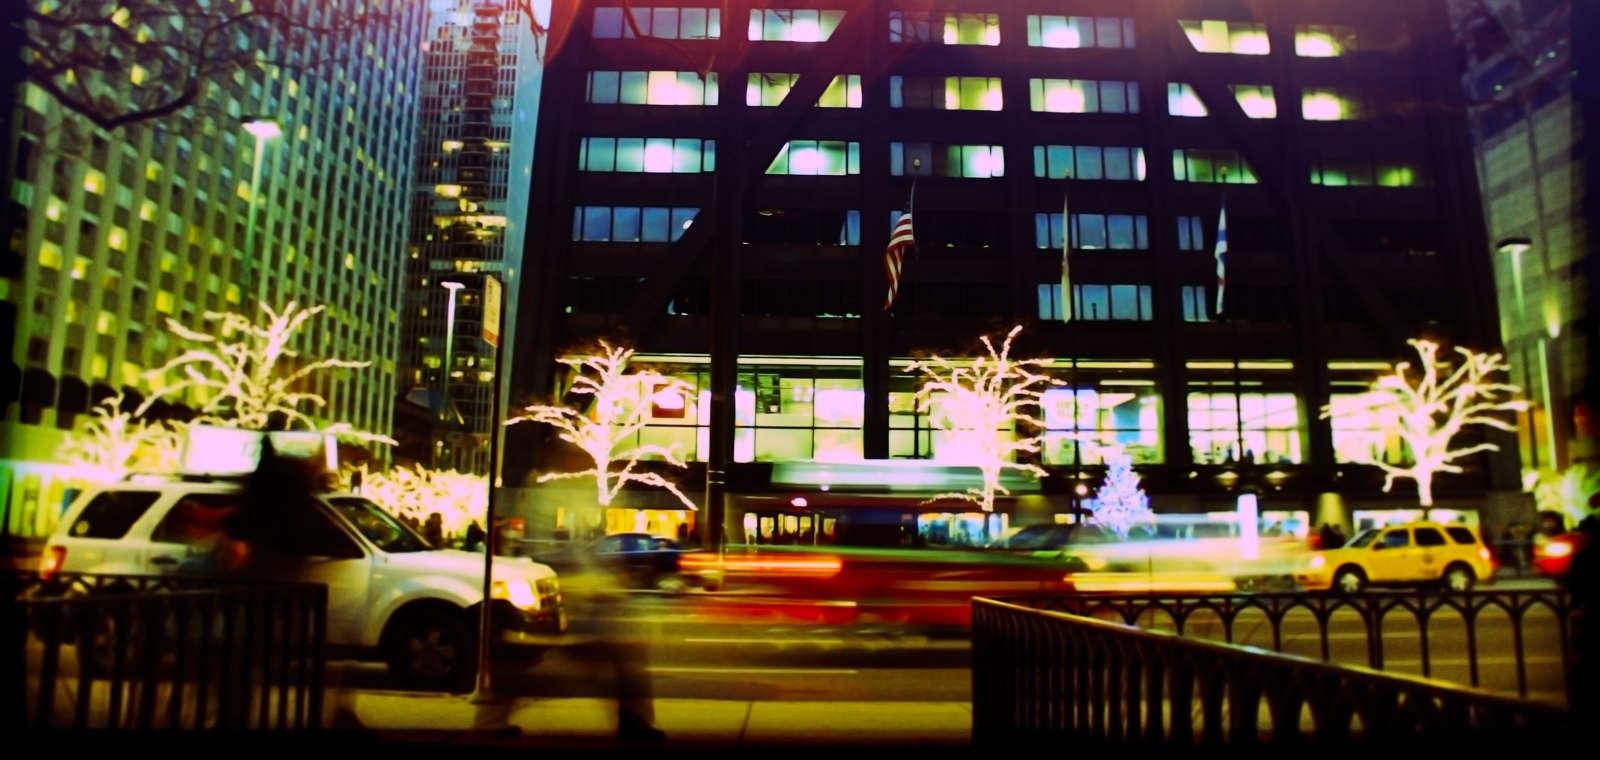 Hotel Lincoln_John Hancock_Shutterstock 12.3.18